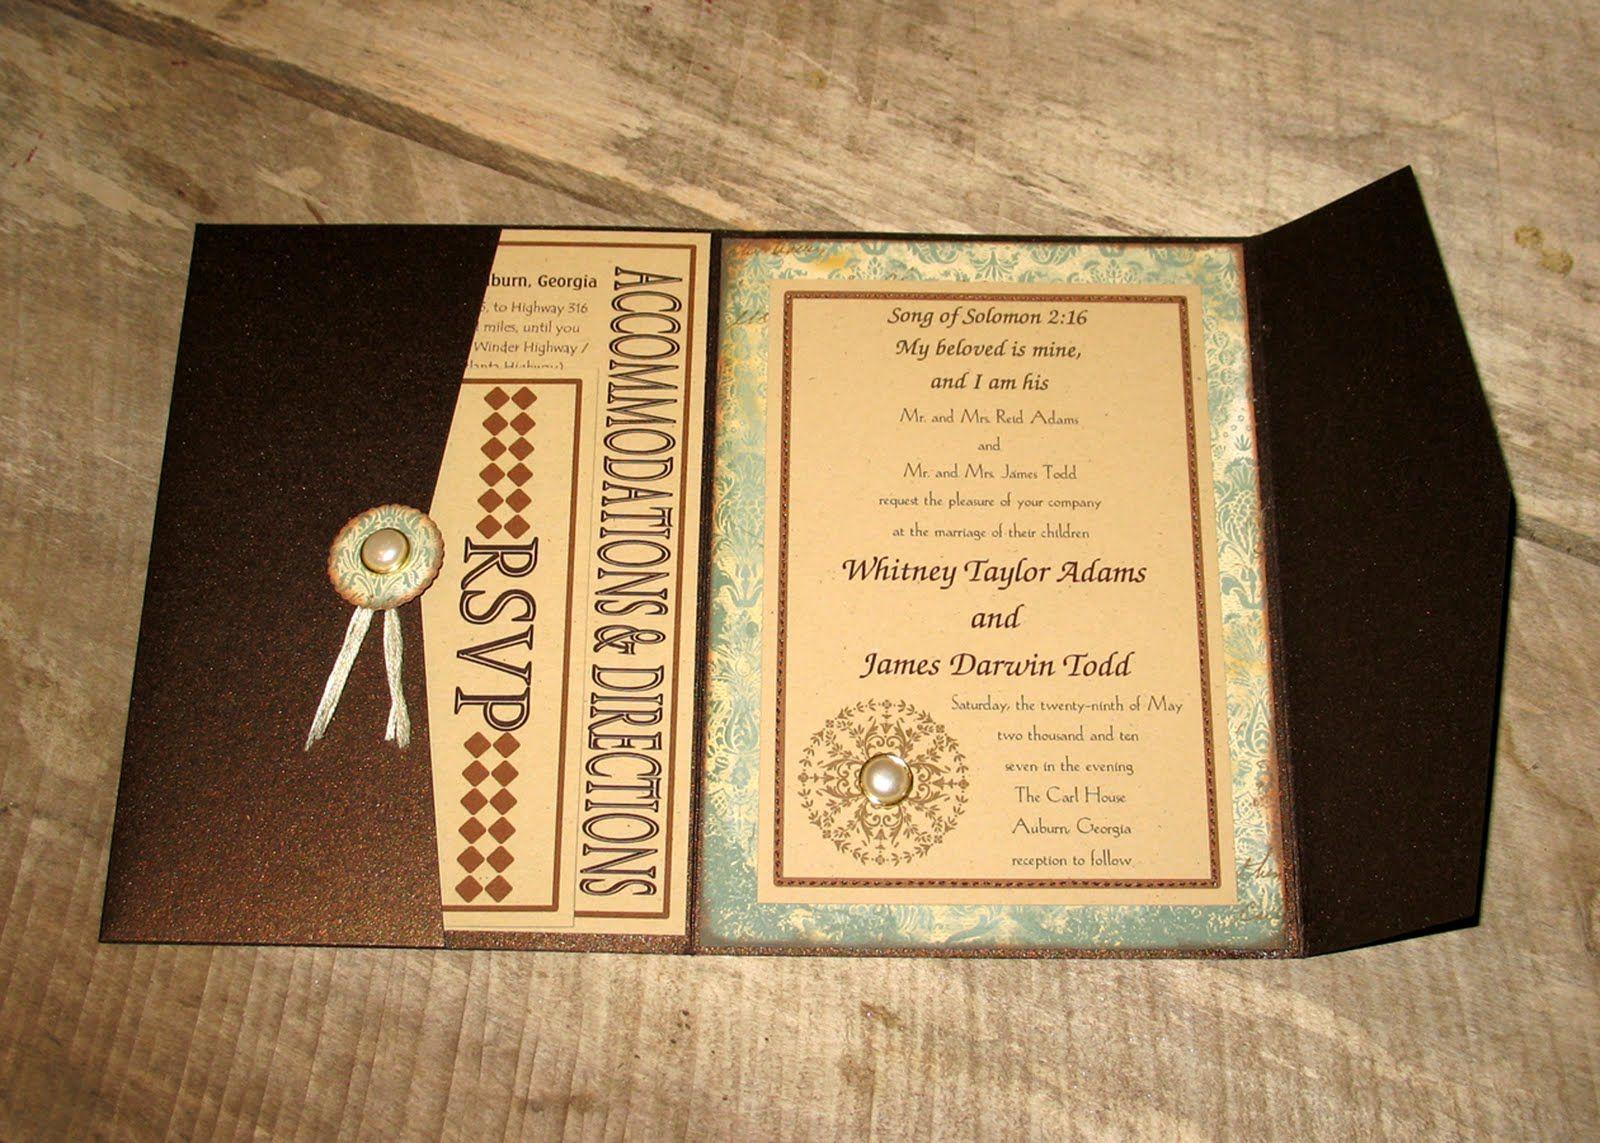 Invite to the Vintage Wedding...